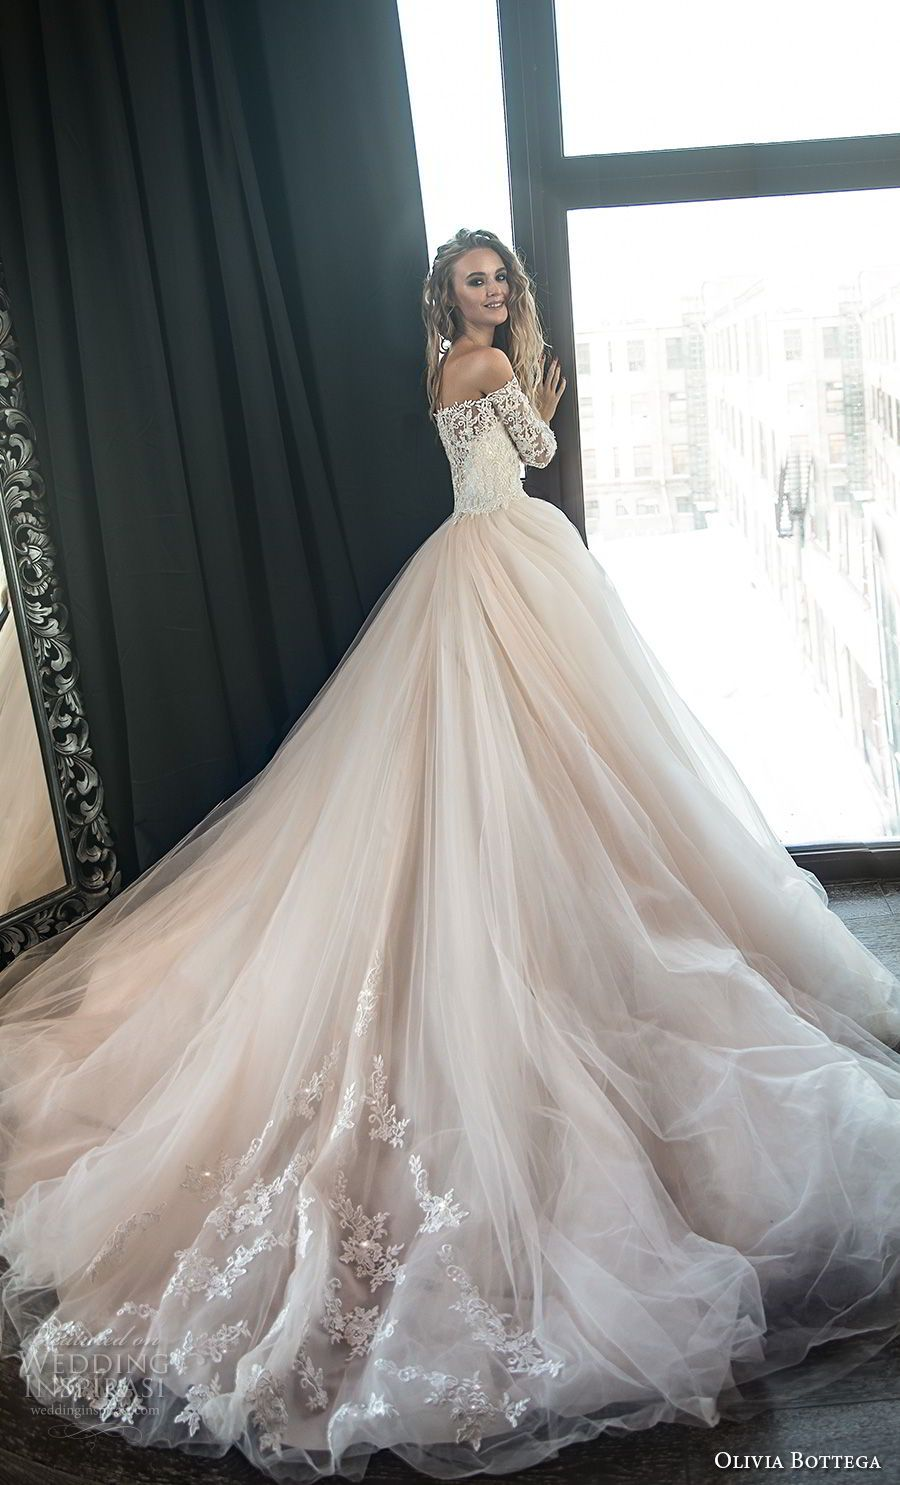 Ball gowns wedding dresses  Olivia Bottega  Wedding Dresses  Wedding gown  Pinterest